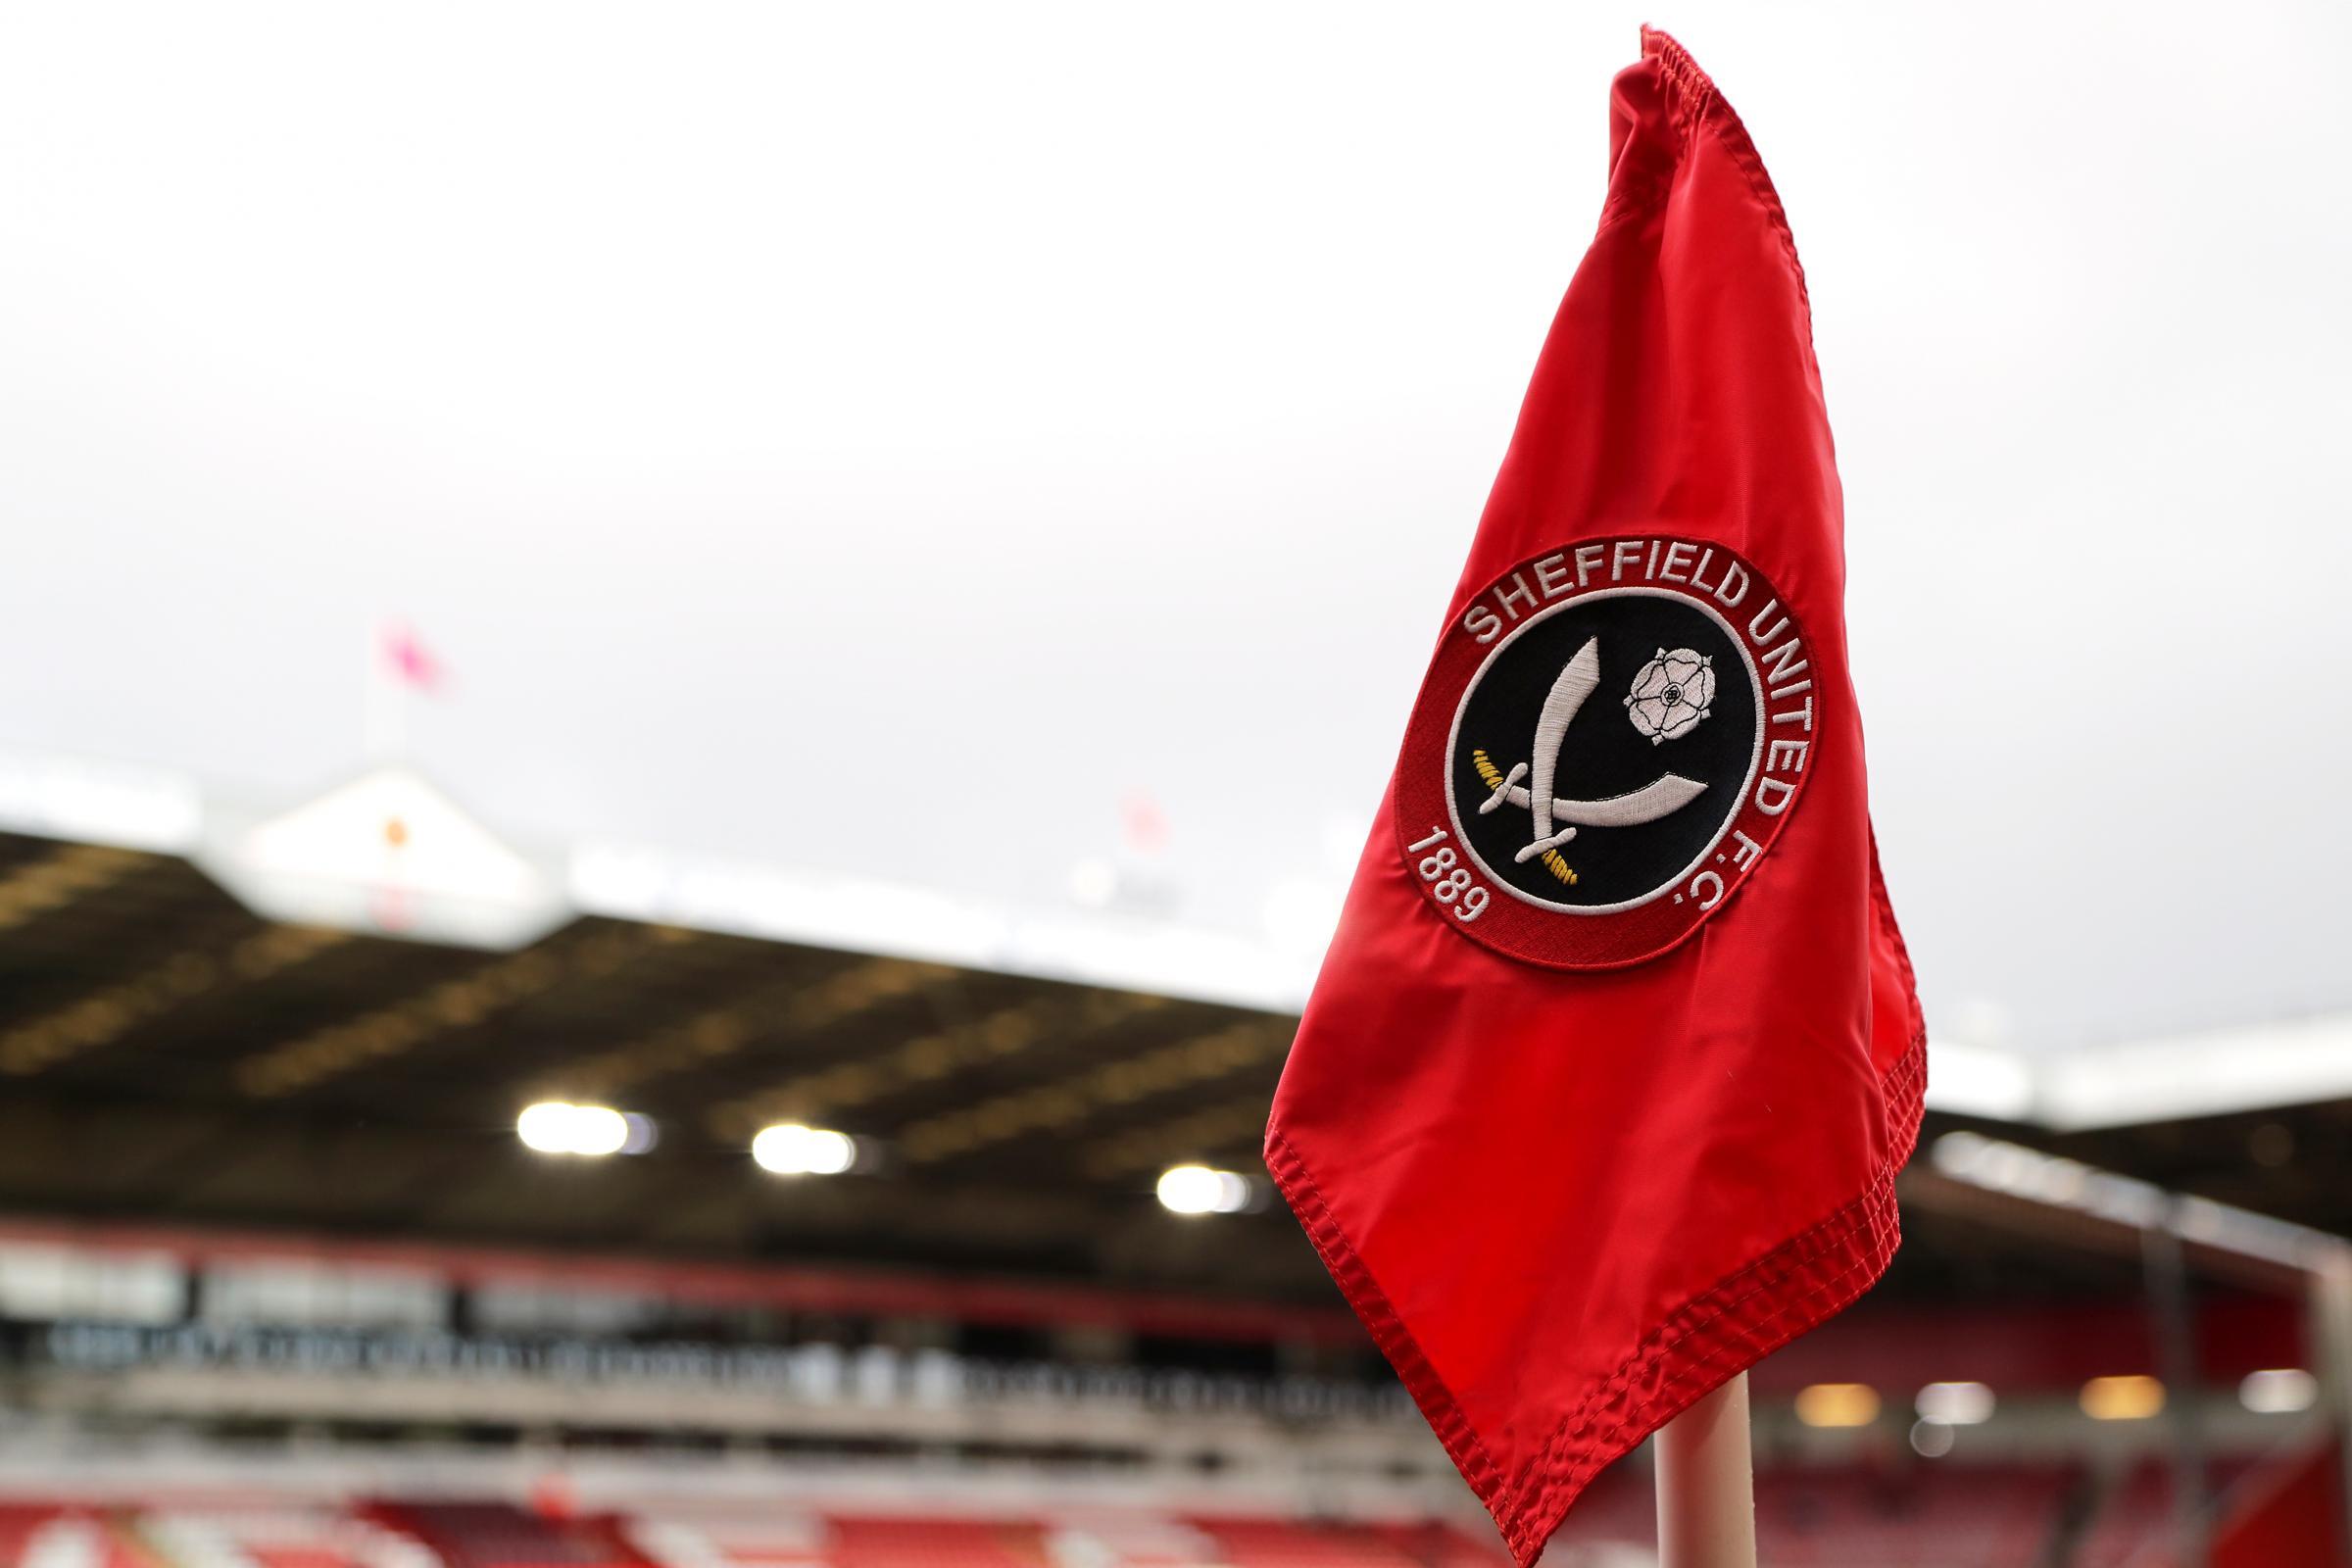 Sheffield United v Burnley: Live updates from Bramall Lane